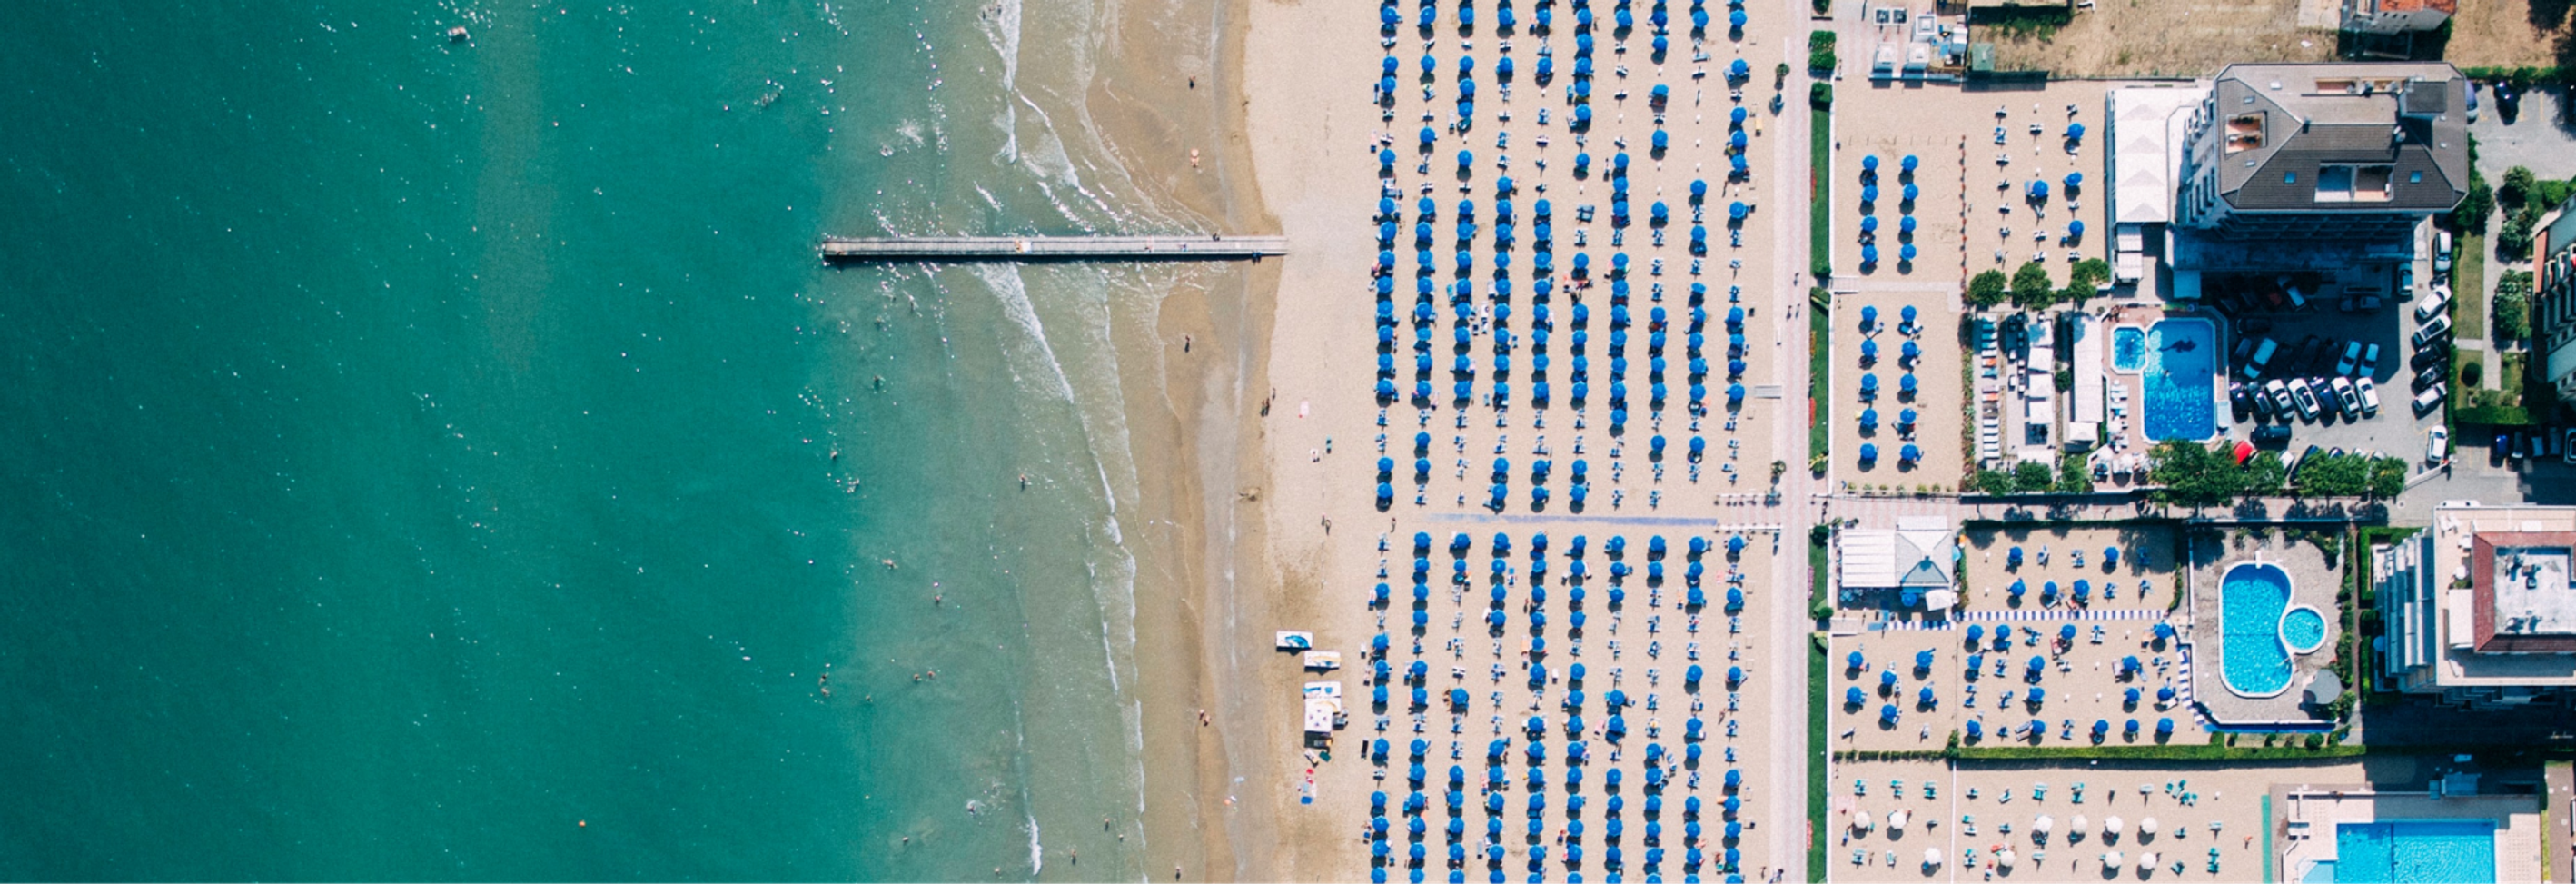 An overhead view of a beach meeting the ocean